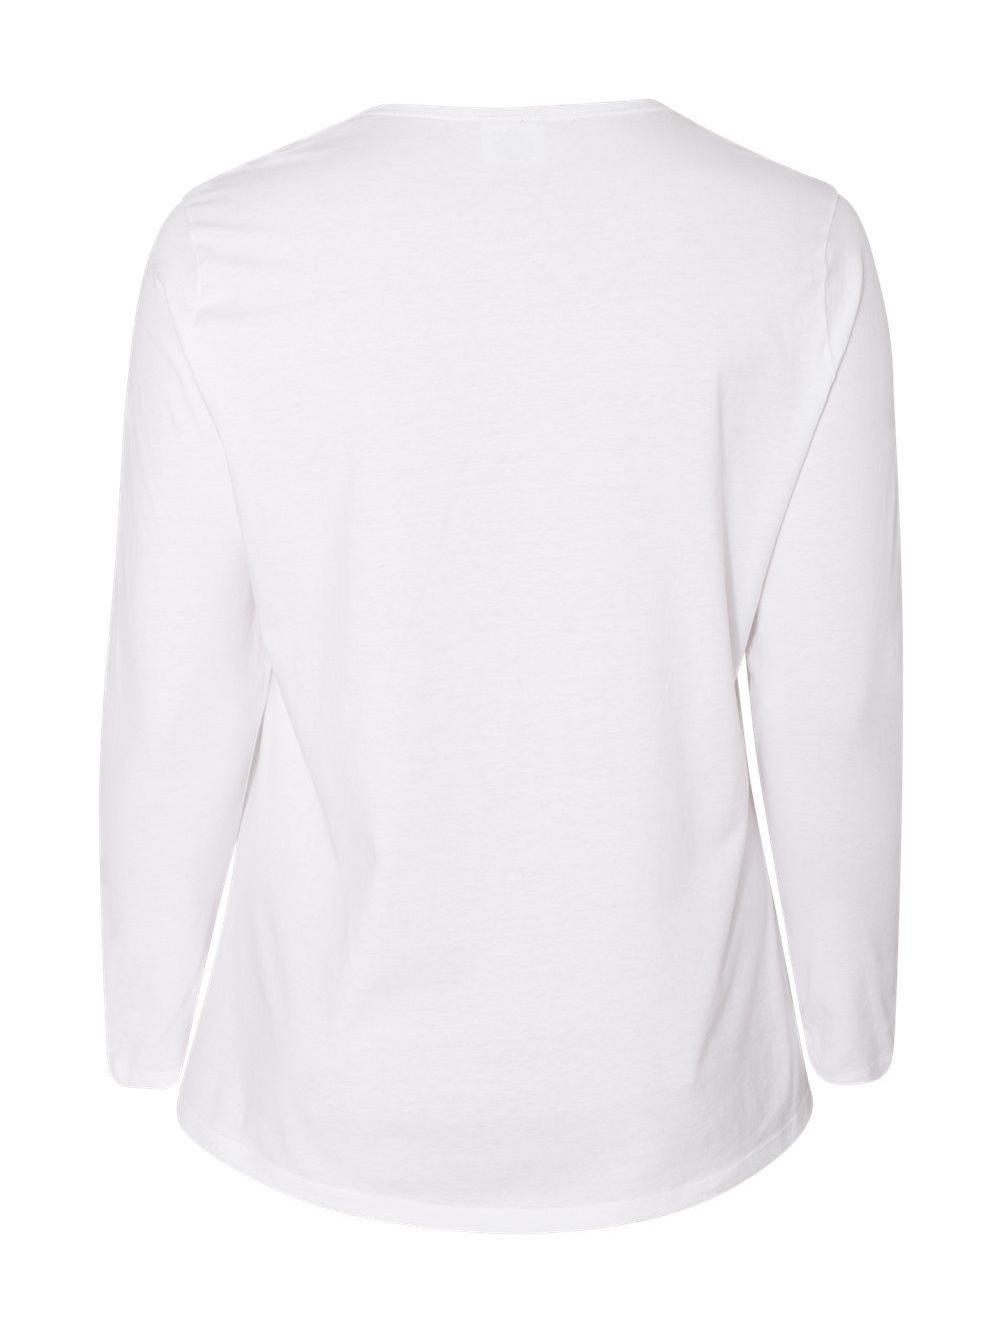 Just-My-Size-Women-039-s-Long-Sleeve-T-Shirt-JMS40 thumbnail 19